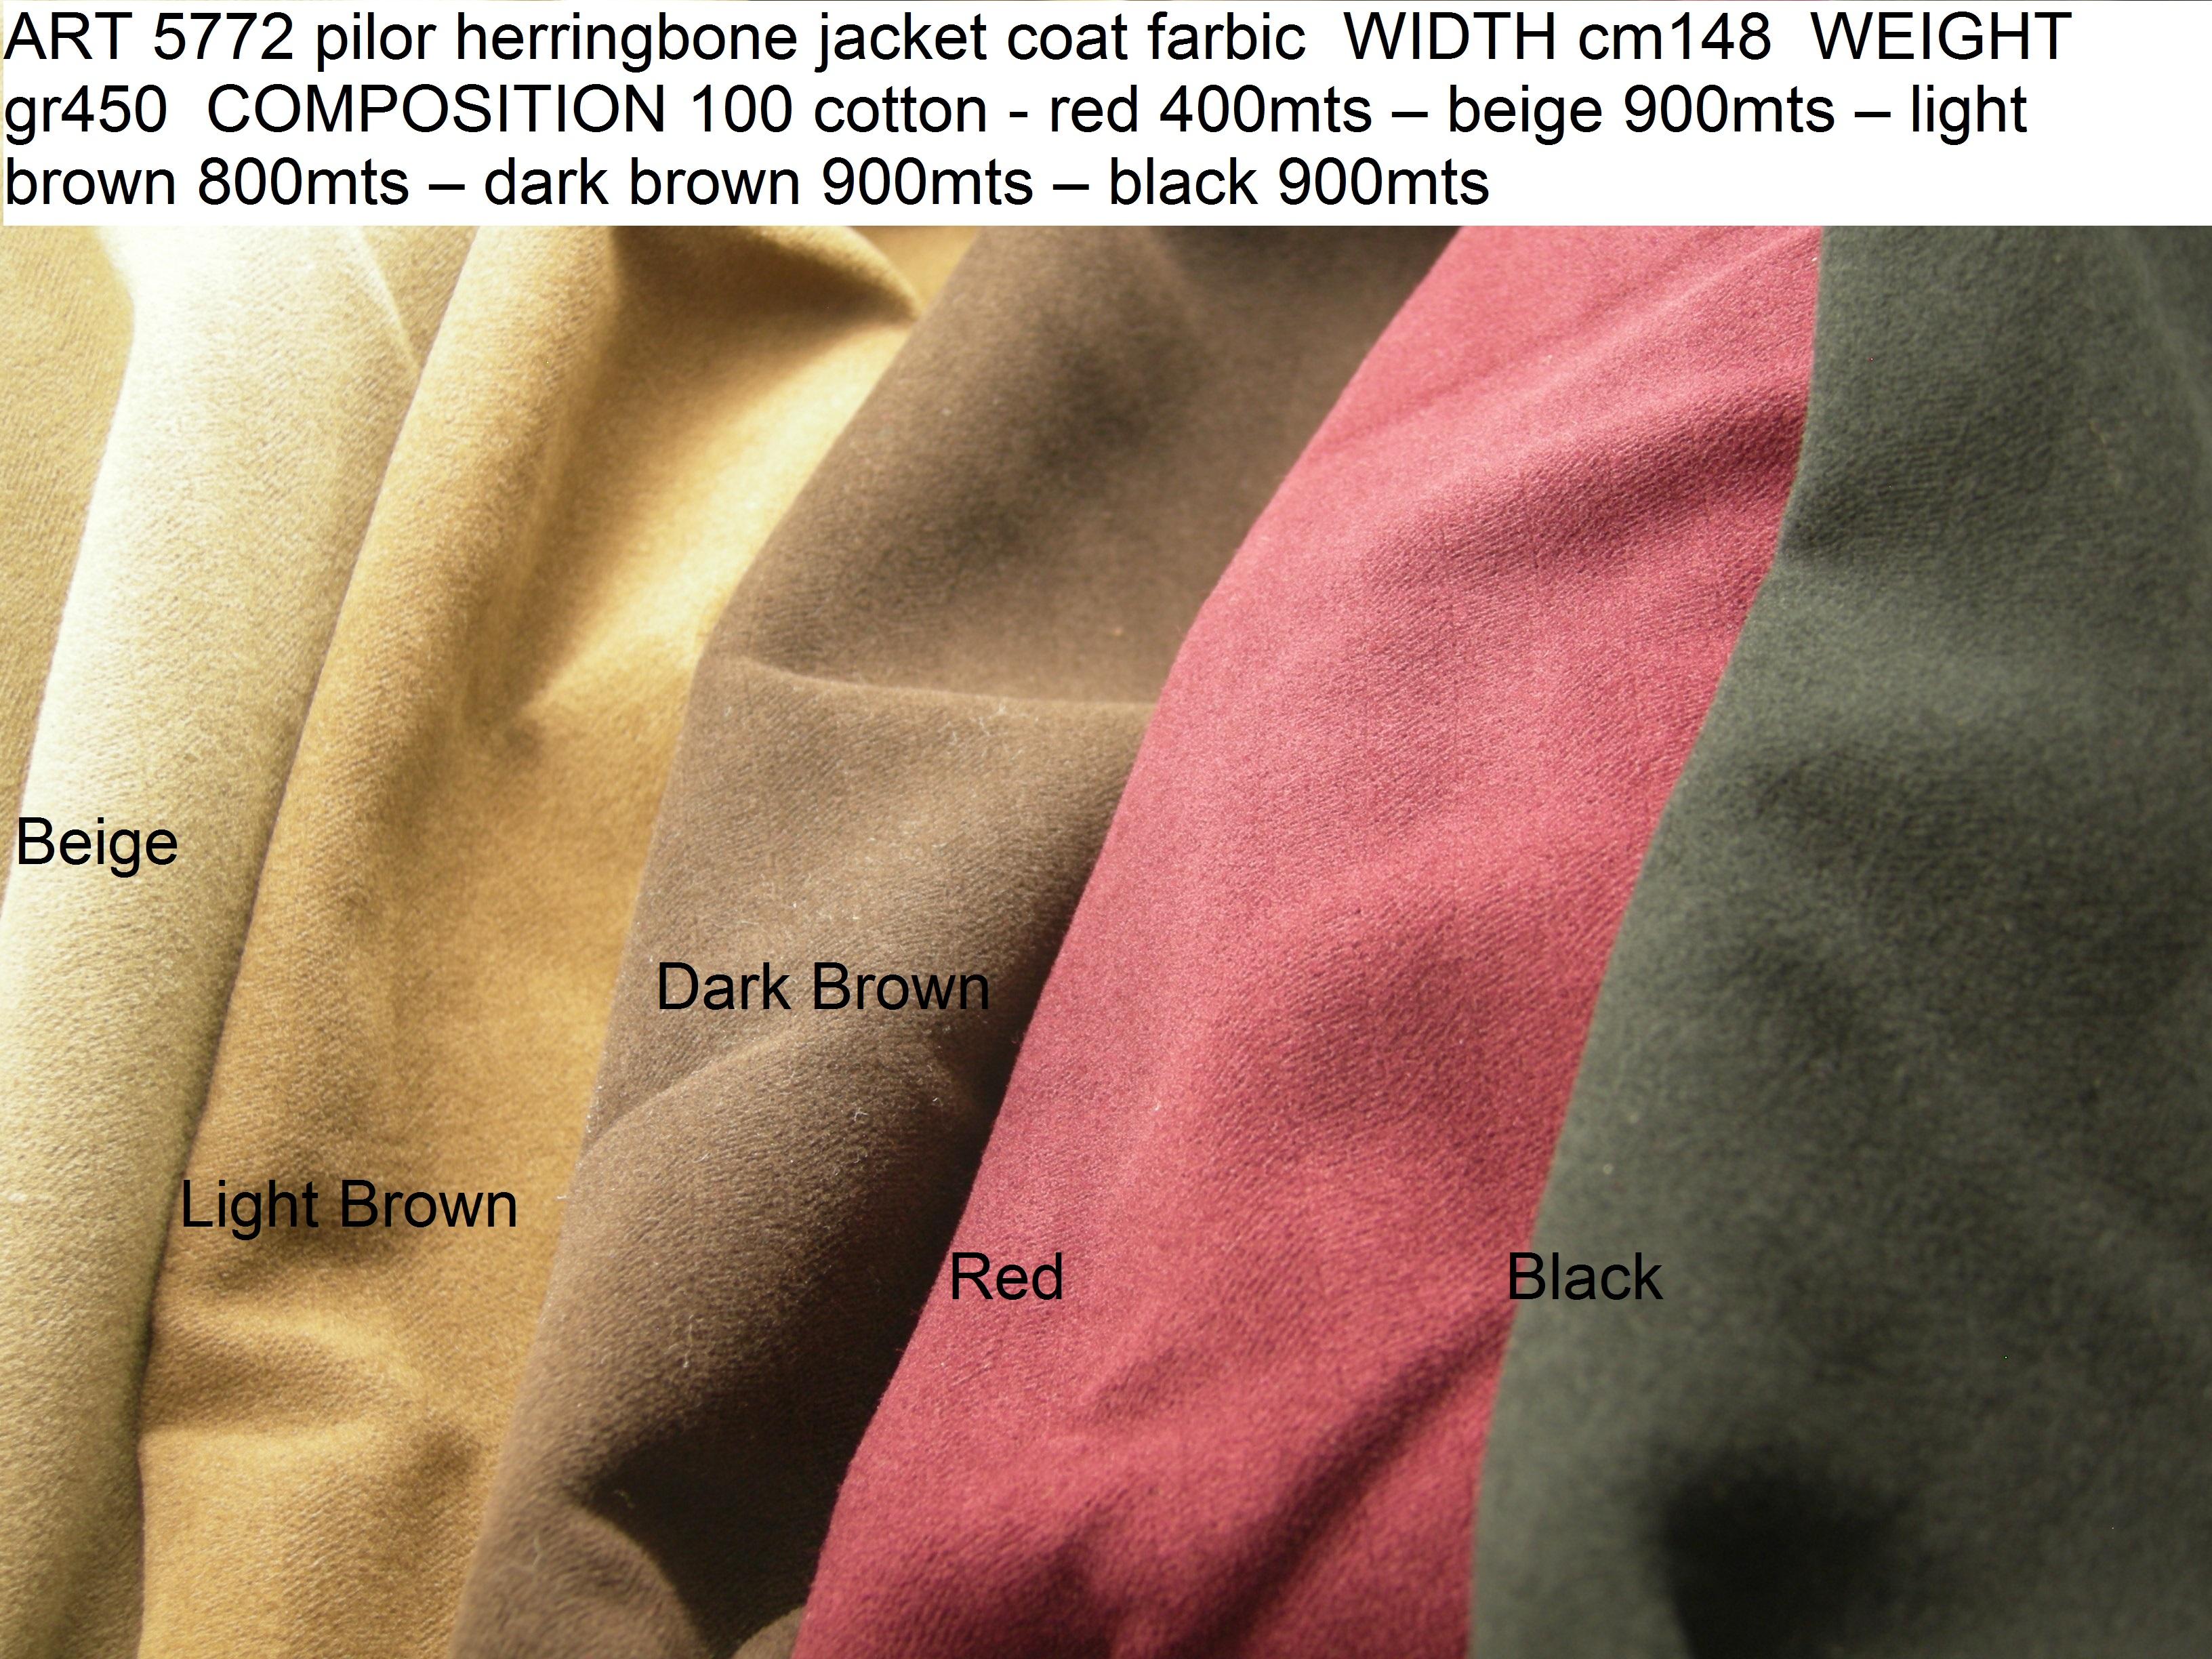 ART 5772 pilor herringbone jacket coat farbic WIDTH cm148 WEIGHT gr450 COMPOSITION 100 cotton - red 400mts – beige 900mts – light brown 800mts – dark brown 900mts – black 900mts